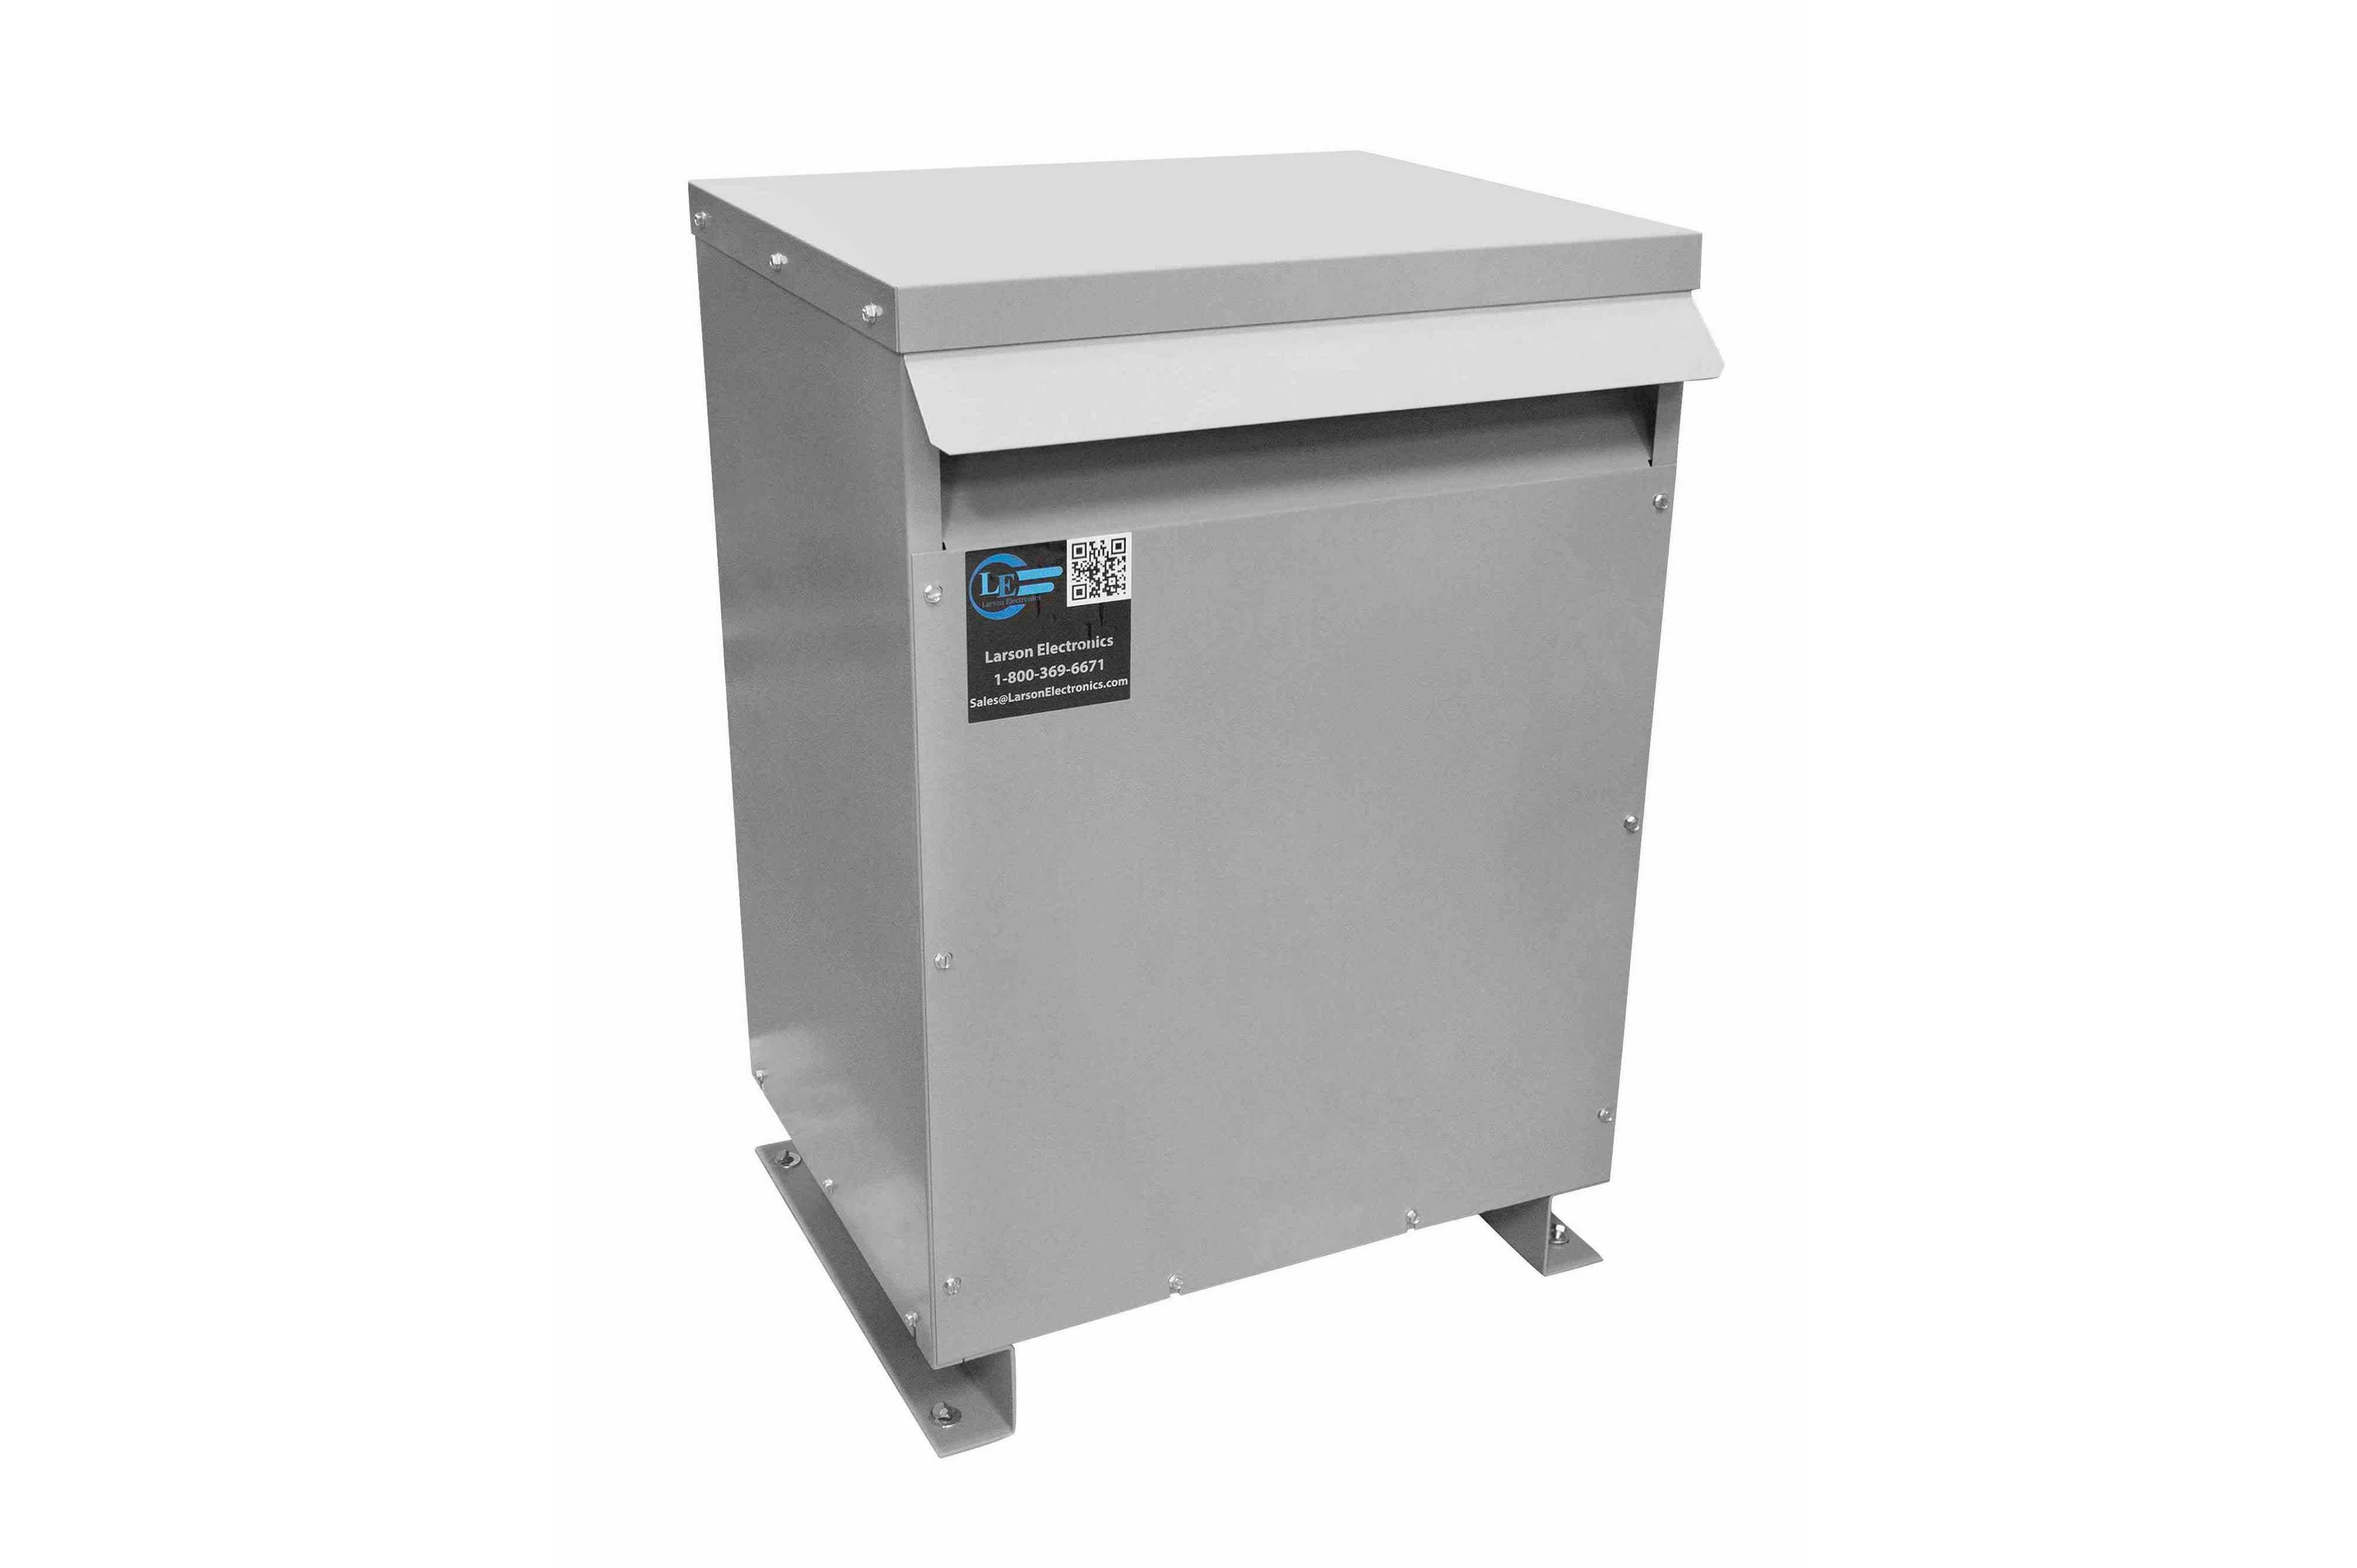 150 kVA 3PH Isolation Transformer, 208V Wye Primary, 240V Delta Secondary, N3R, Ventilated, 60 Hz